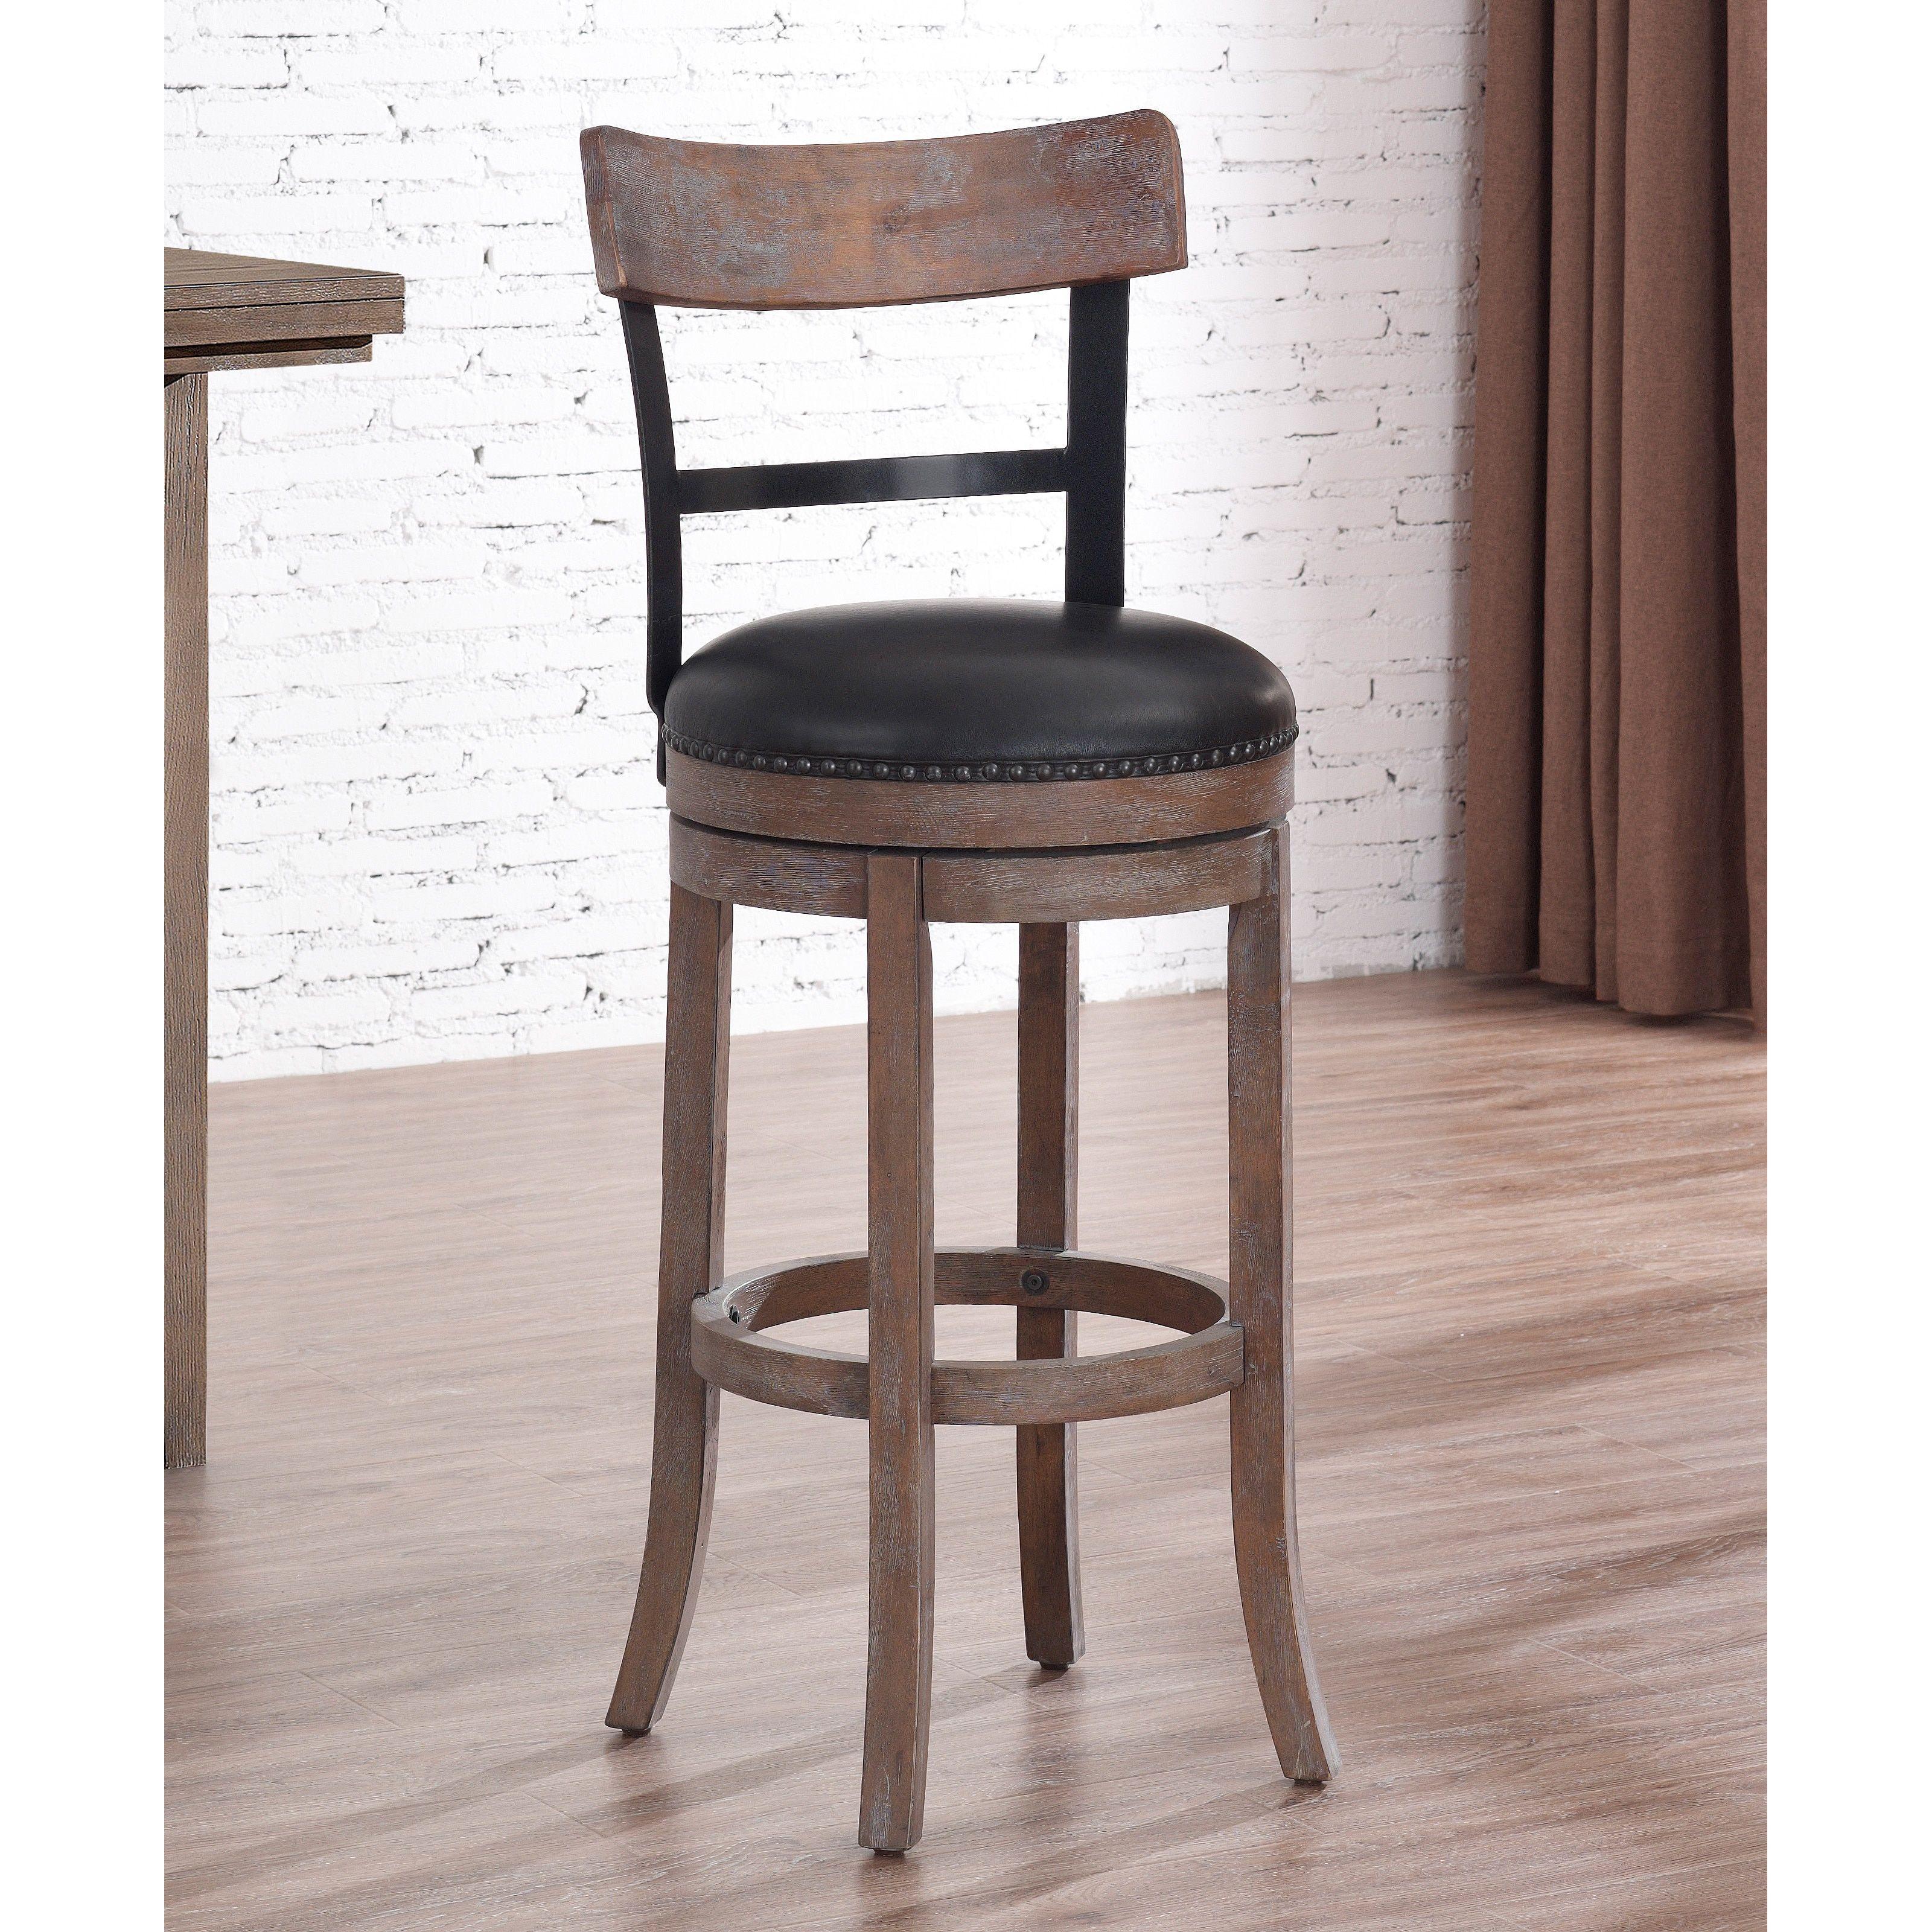 Brilliant Greyson Living Siena Swivel Bar Stool Siena 30 Brown Cjindustries Chair Design For Home Cjindustriesco